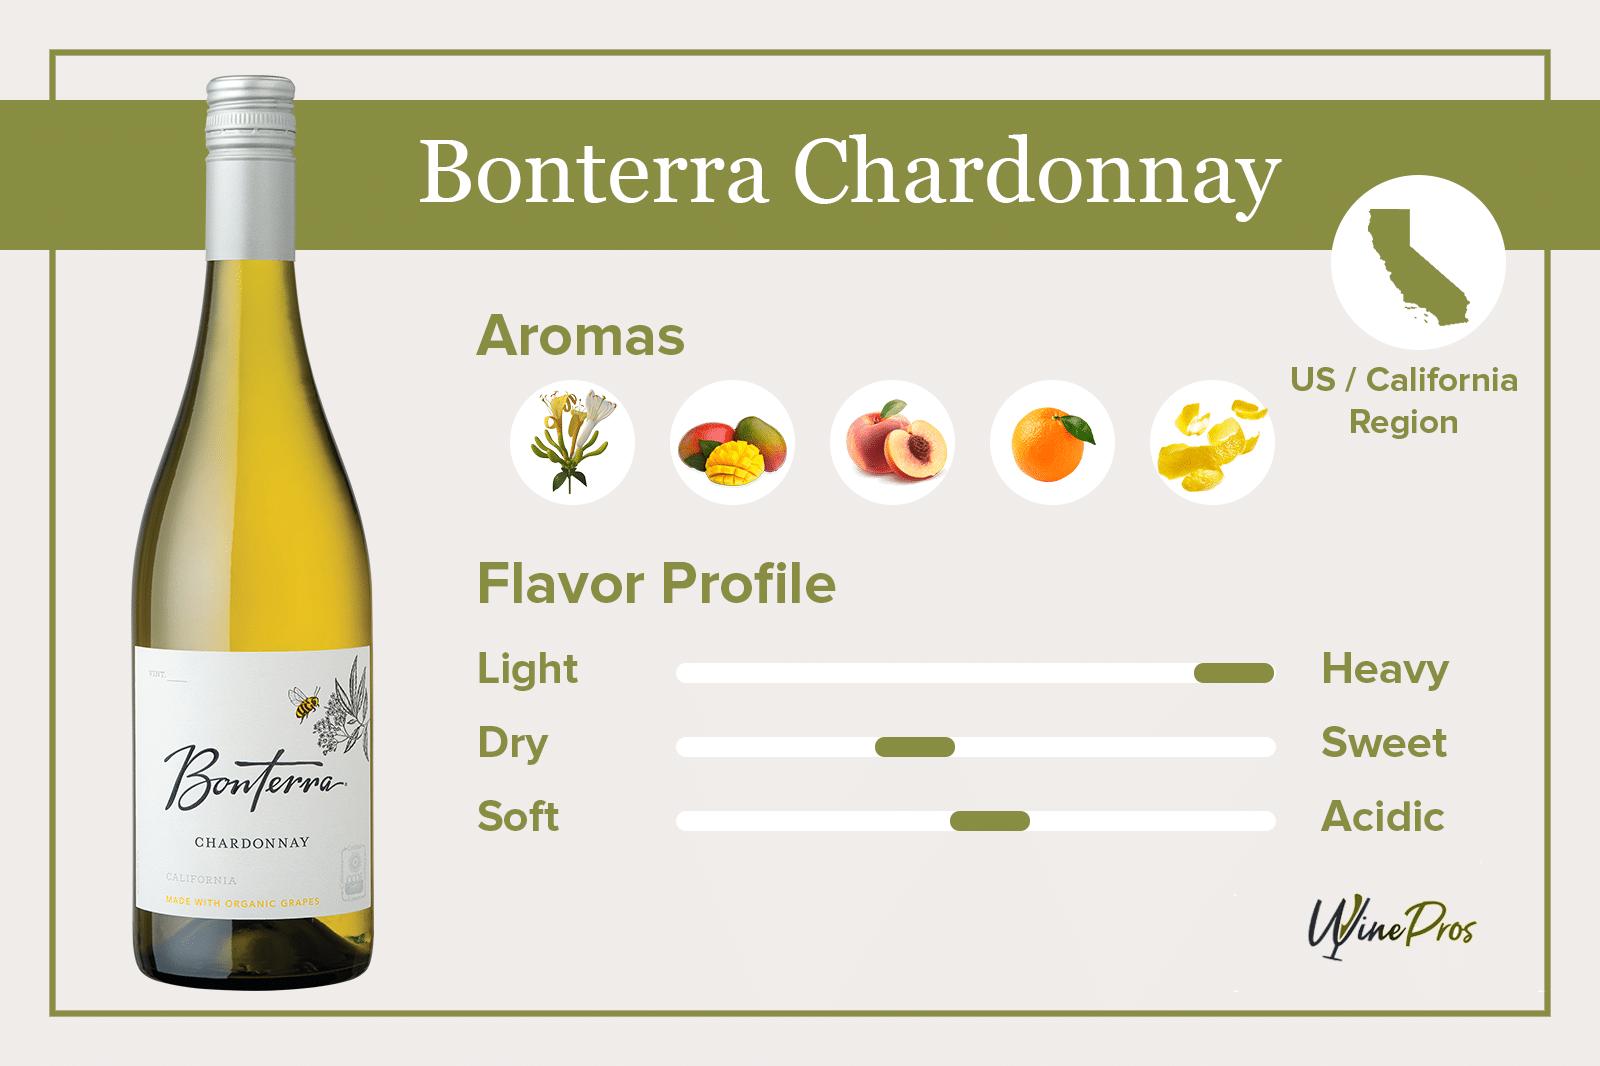 Bonterra Chardonnay Review (2021)